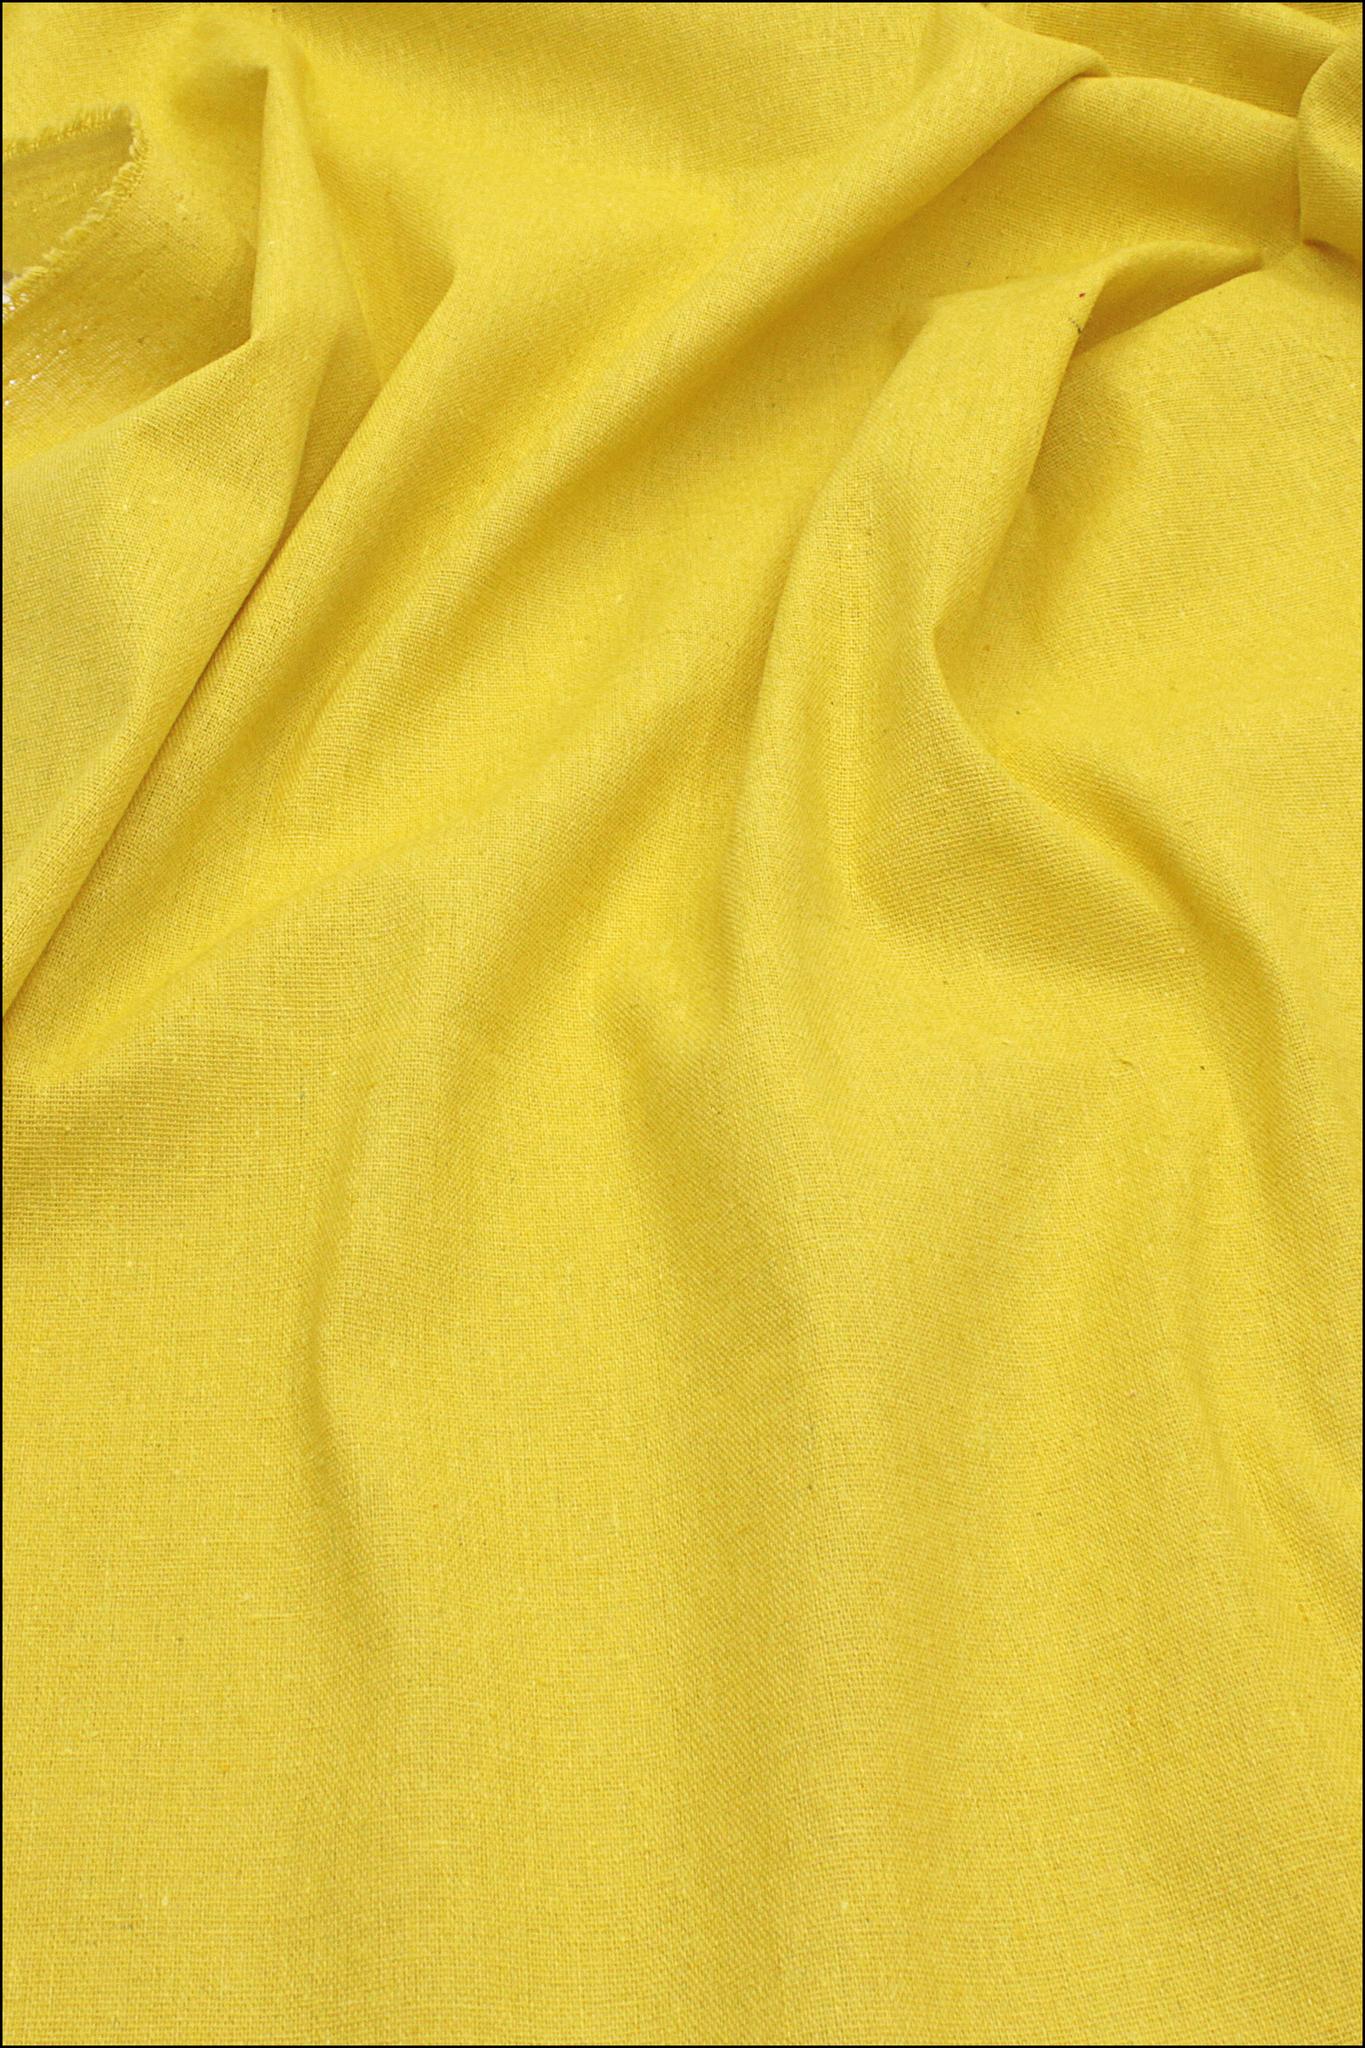 Желтое солнце, хлопок-лен